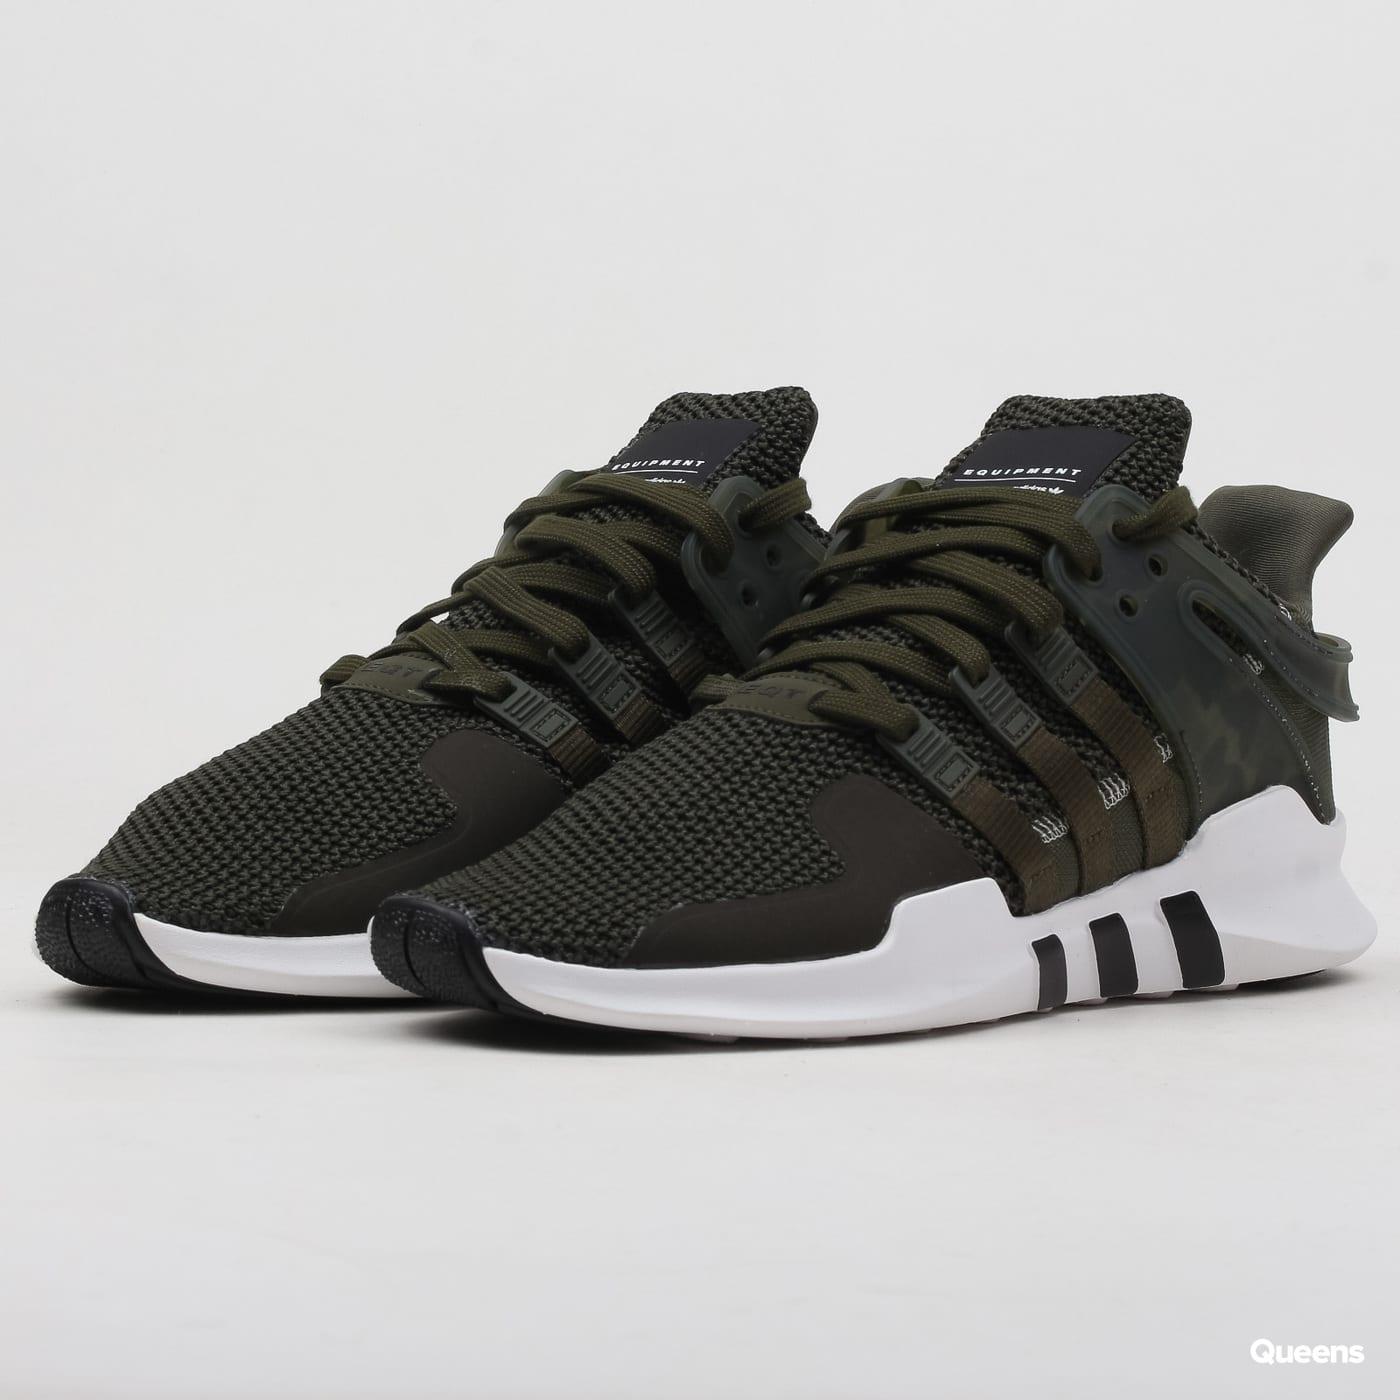 promo code 07412 9c10b Sneakers adidas Originals EQT Support ADV (B37346)– Queens 💚